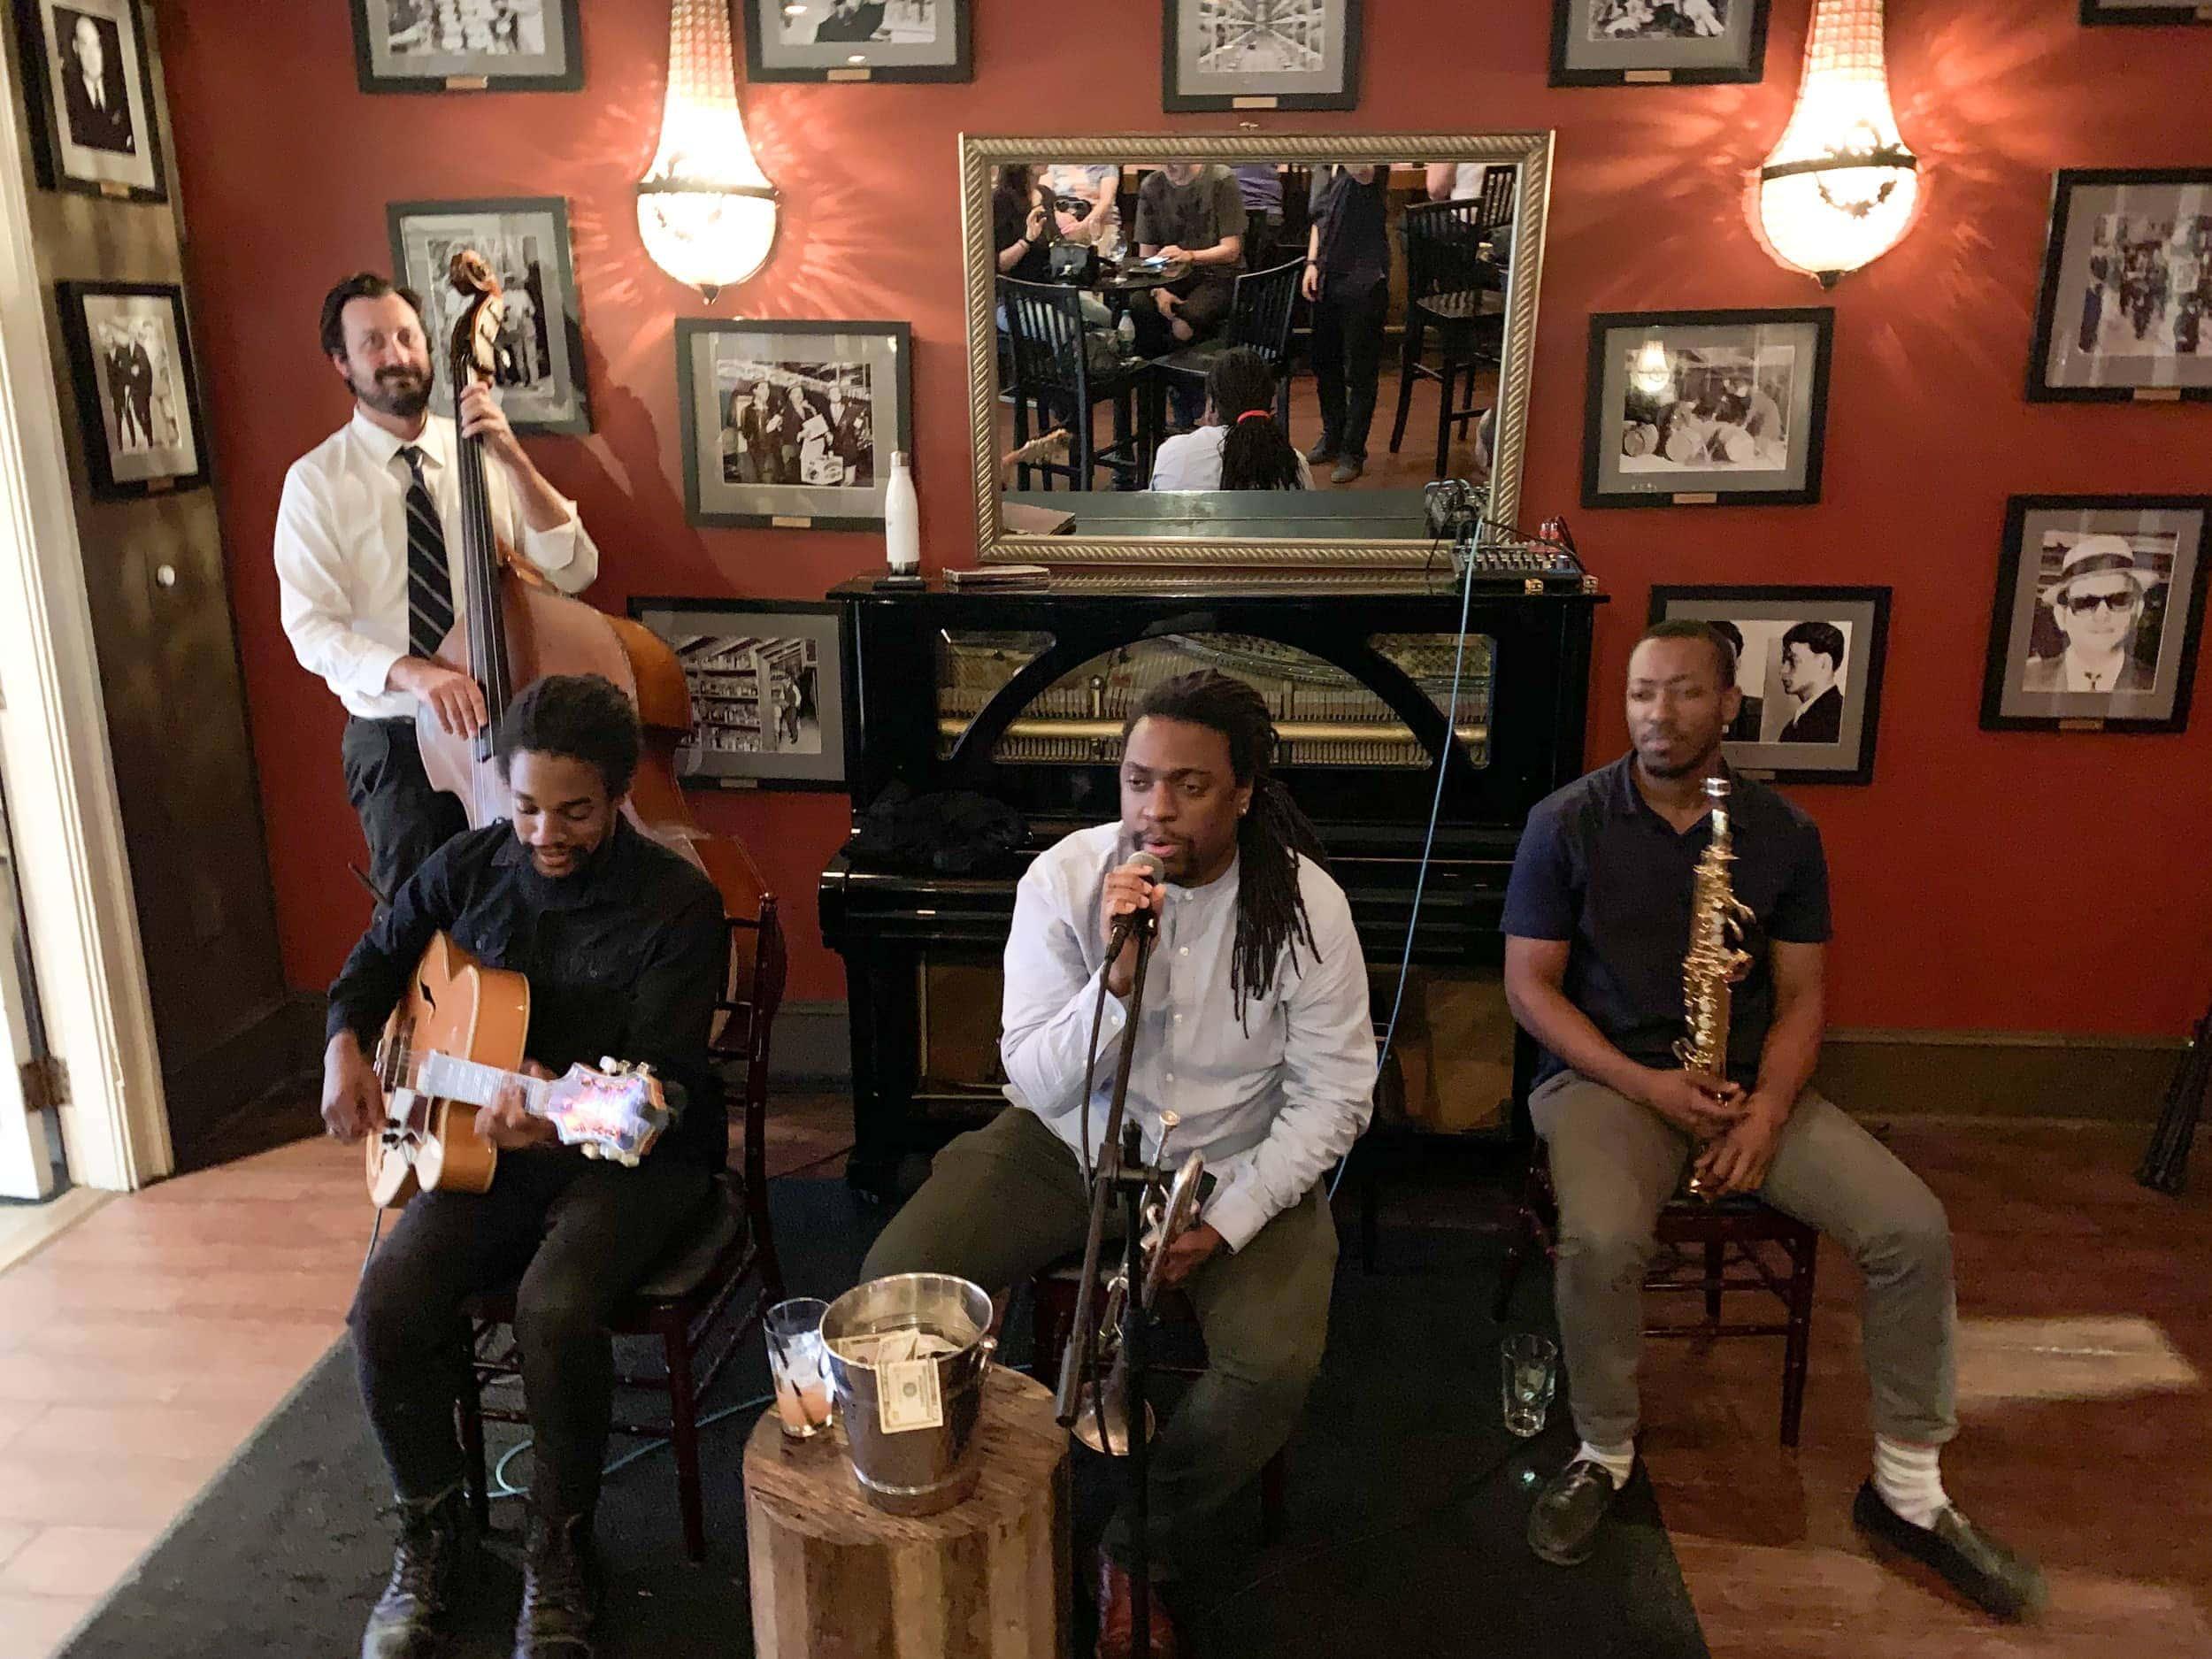 Live jazz at the 21st Amendment Bar